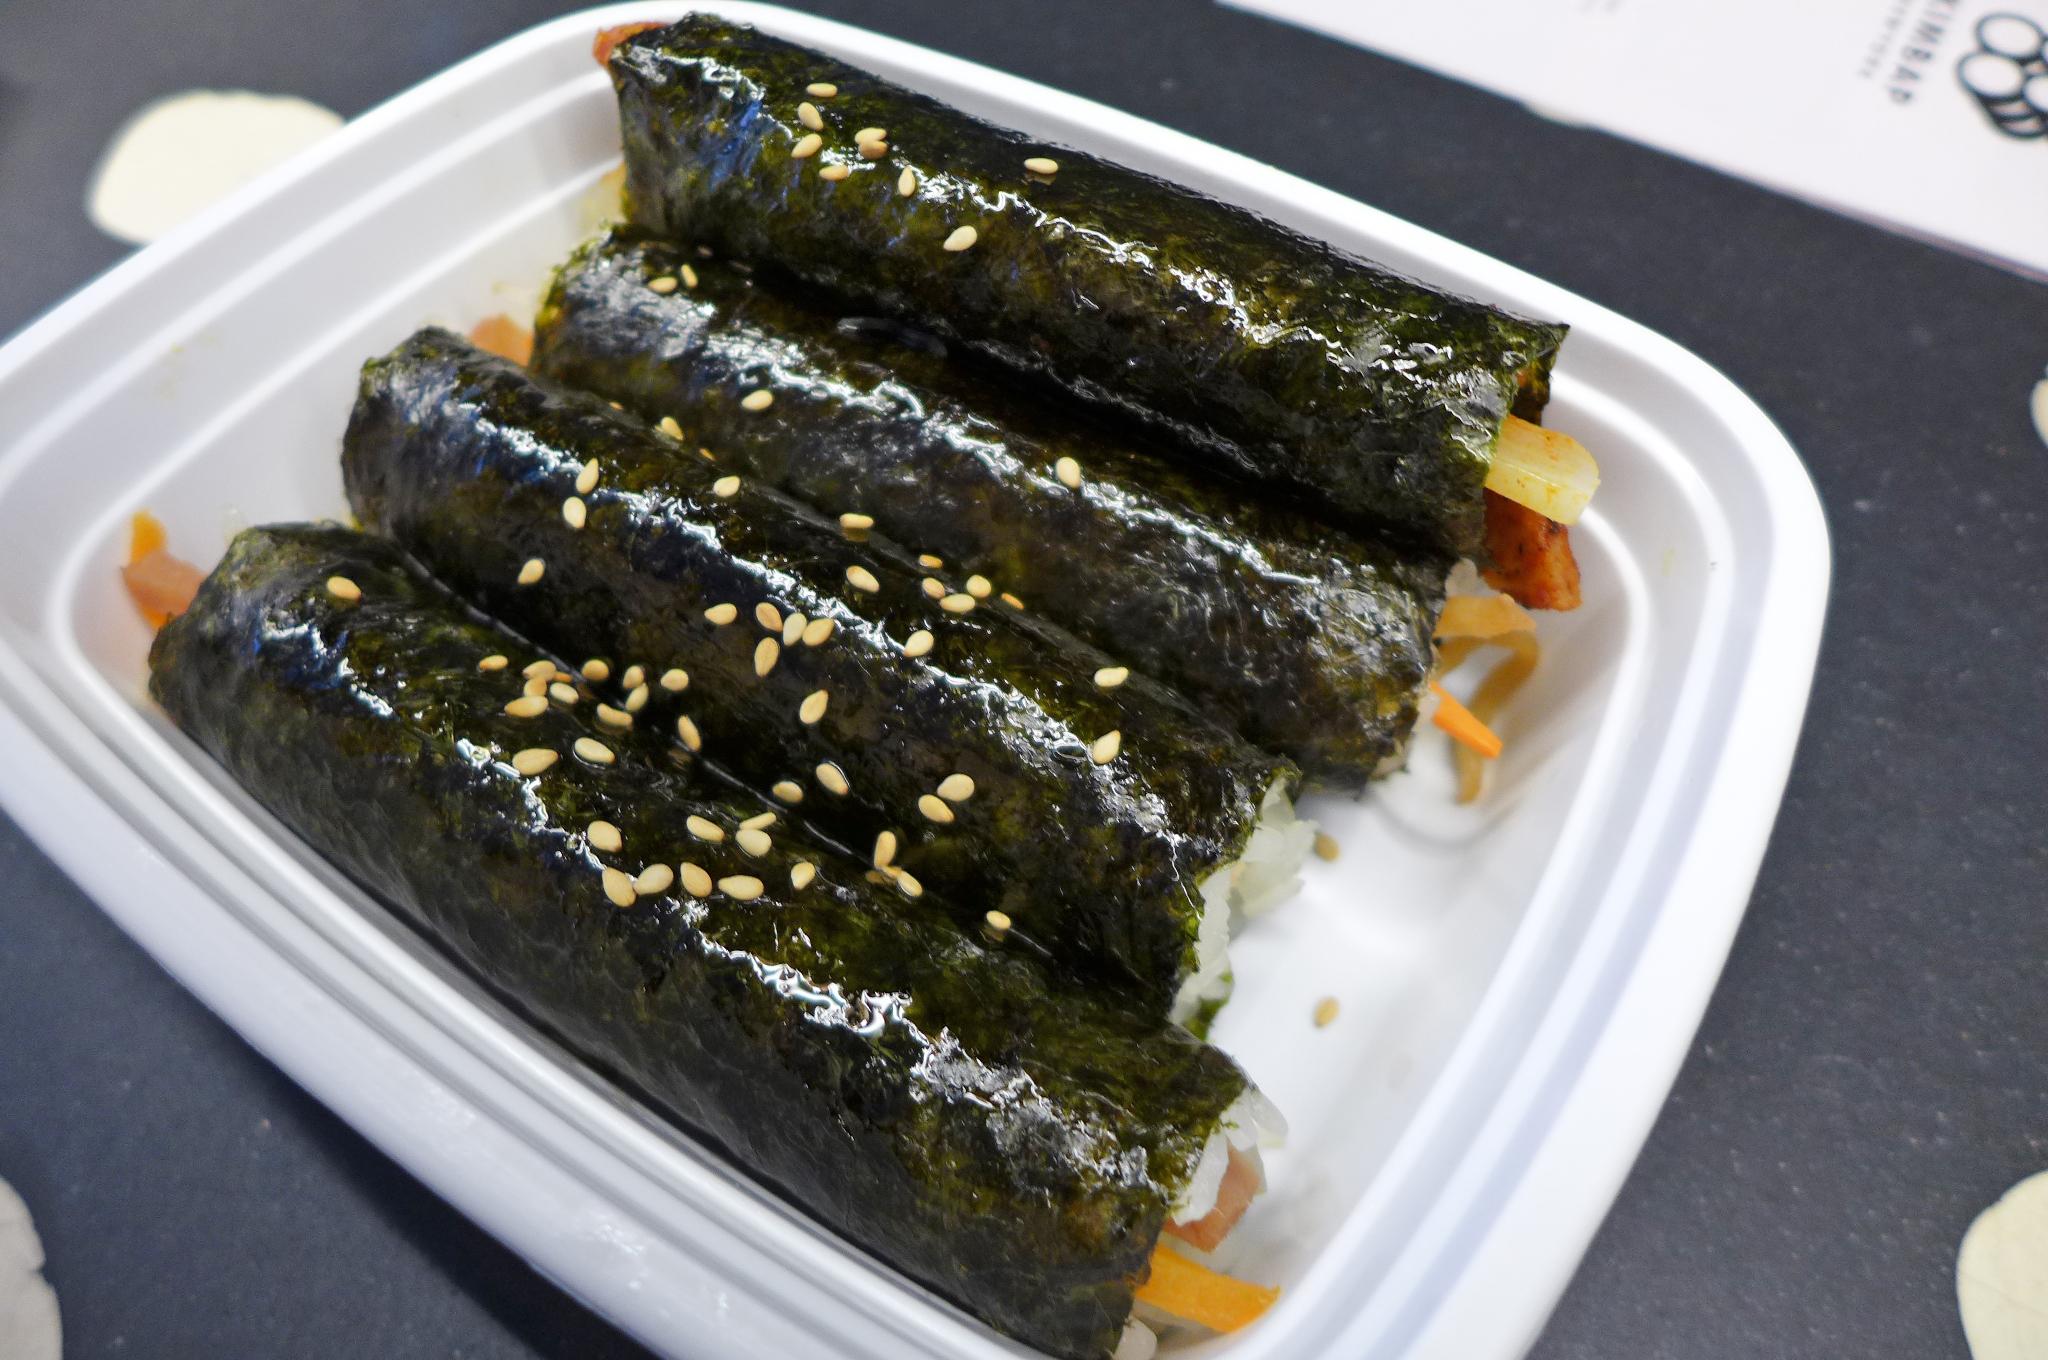 Sprinkled with sesame seeds, four mini kimbap make a nice light meal.